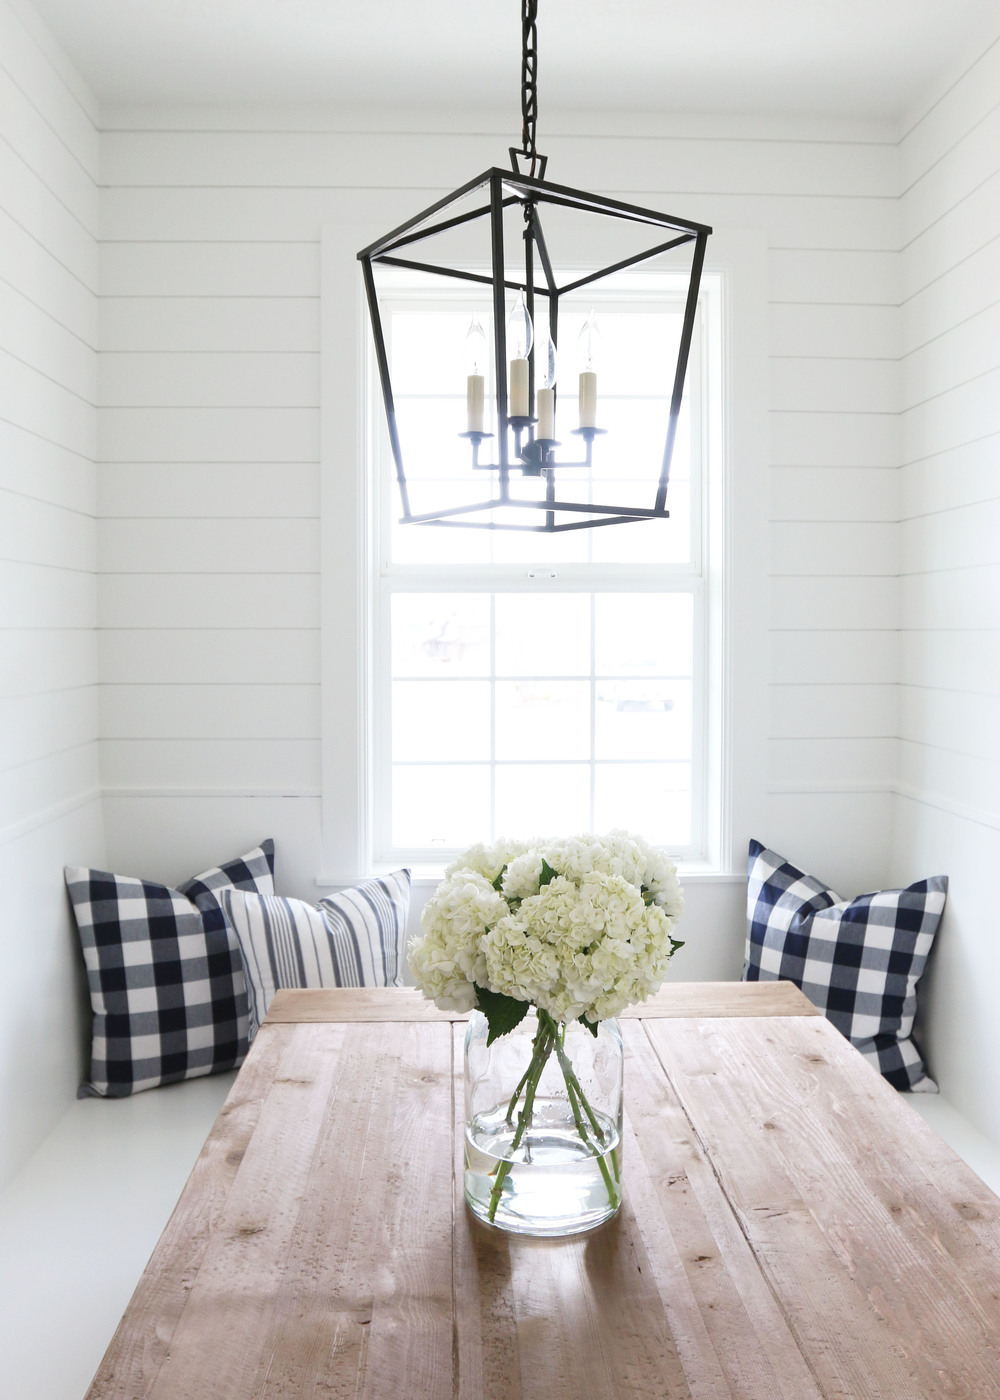 Farmhouse table with lantern and shiplap walls || Studio McGee